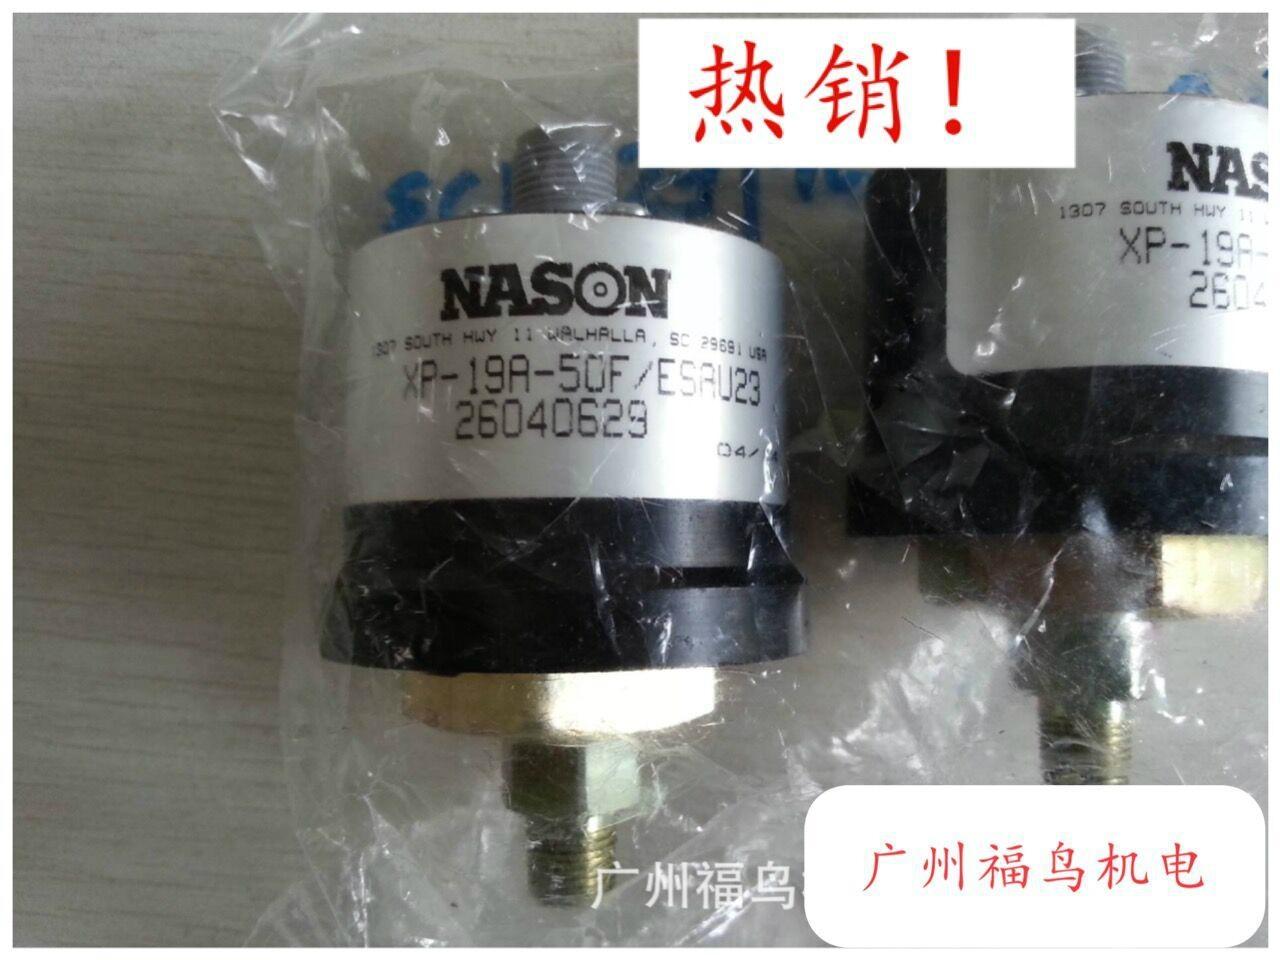 NASON壓力開關, 型號: XP-19A-50F/ESAU23